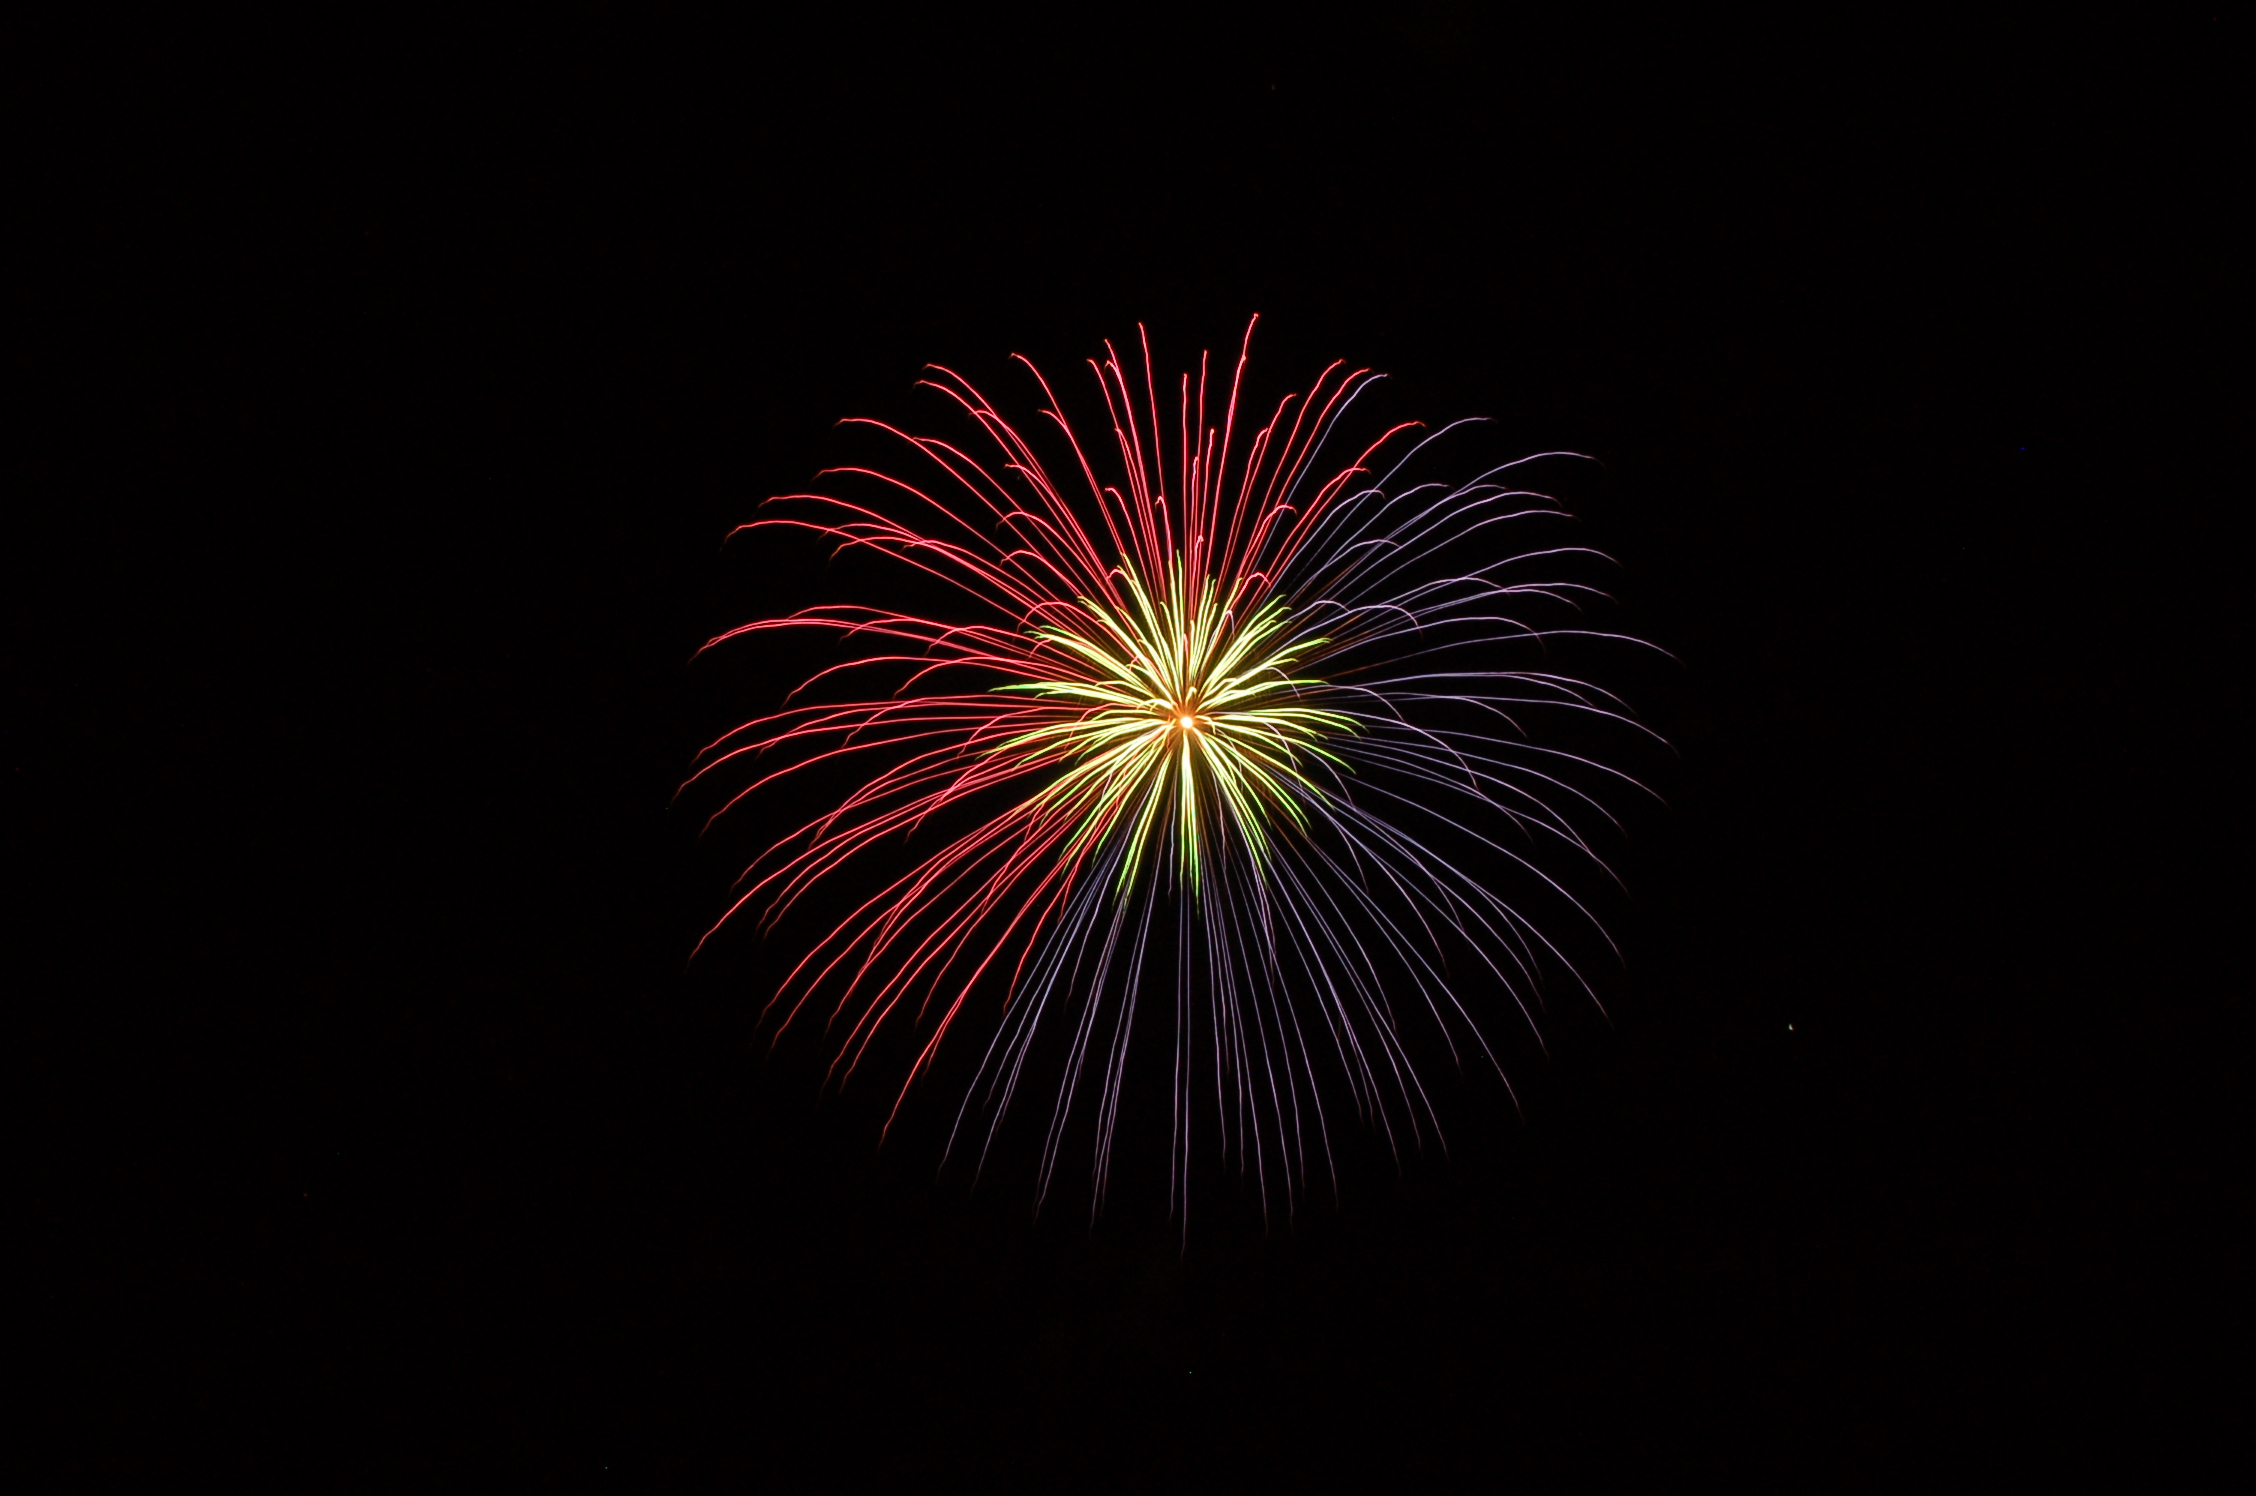 FA_Fireworks_Fireworks035.JPG